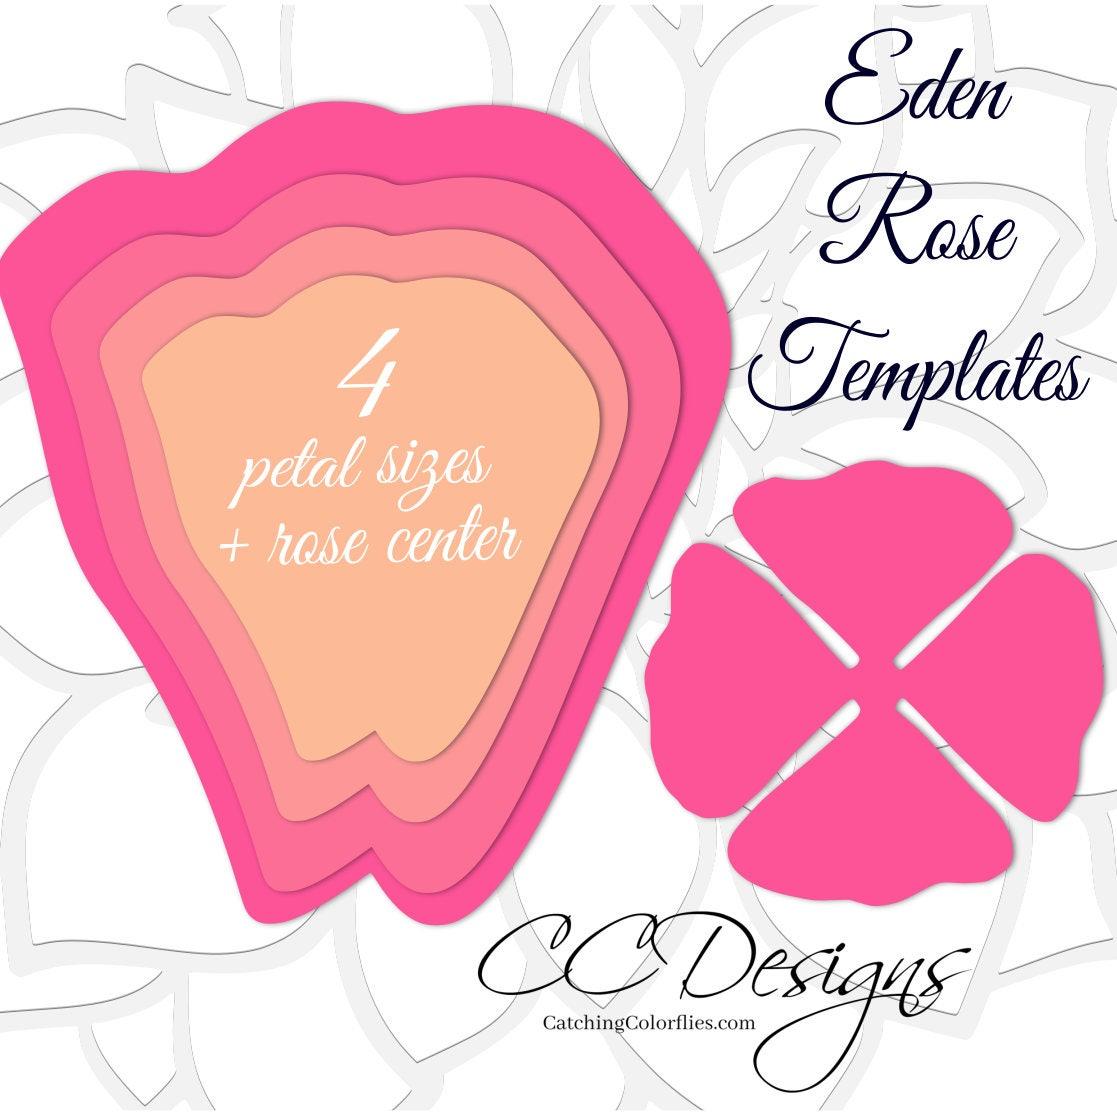 Giant Paper Roses, Paper Rose Flower Patterns, Printable Flower ...